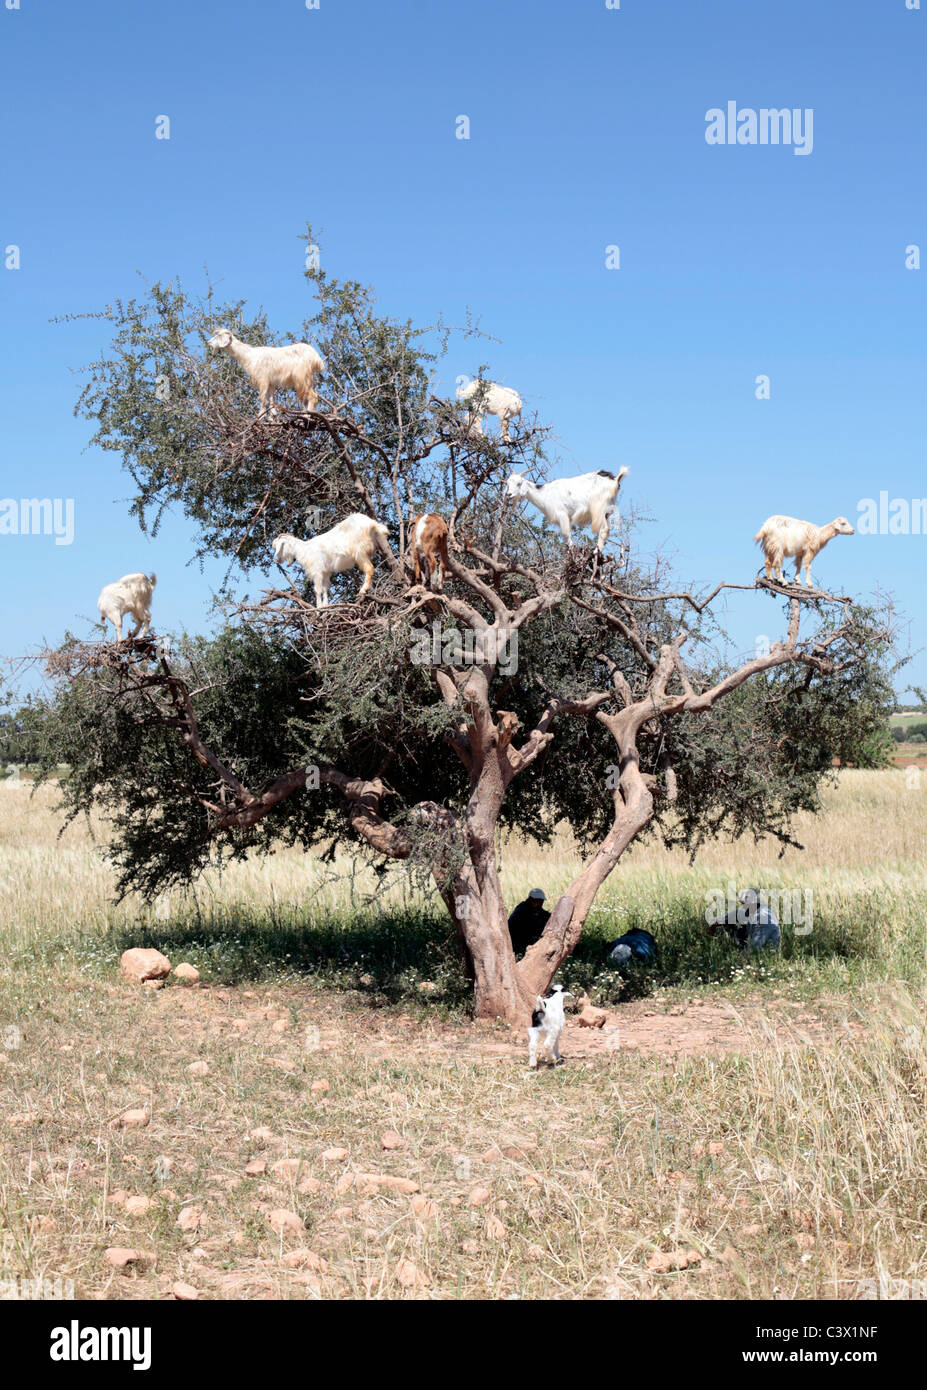 Goats feeding in an Argan tree, Morocco. - Stock Image